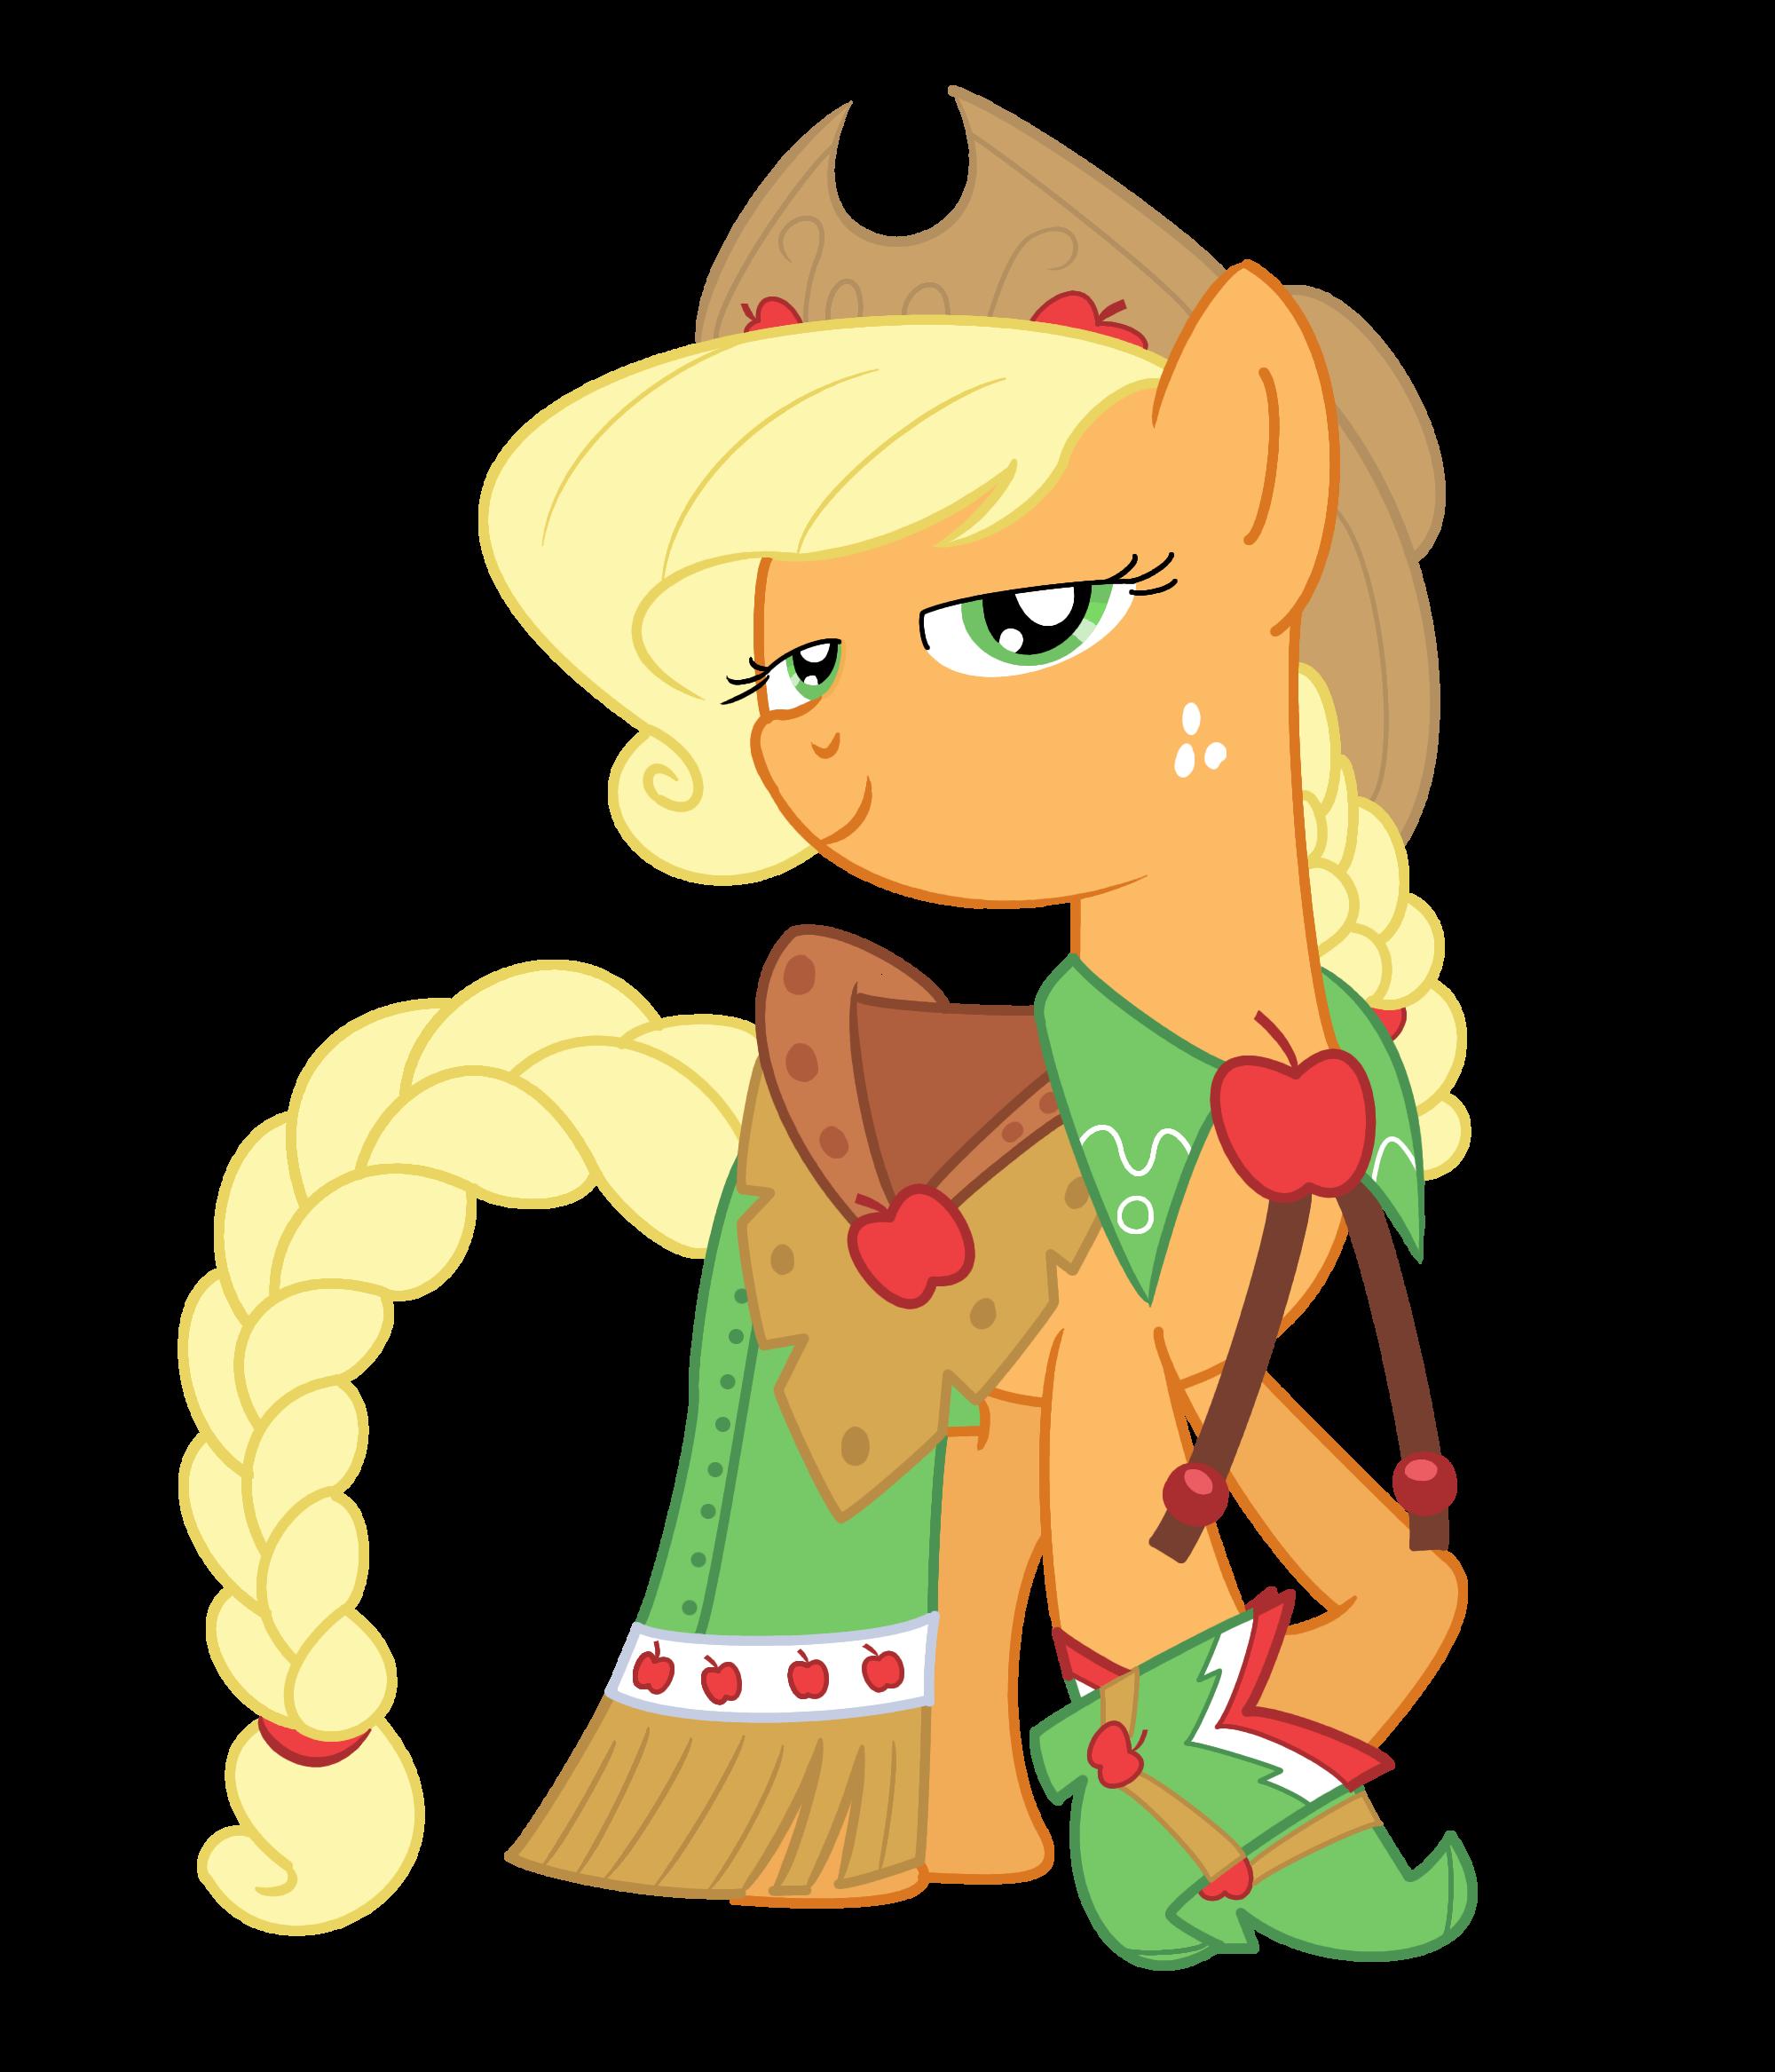 apple jack gala dress by philiptomkins on deviantart